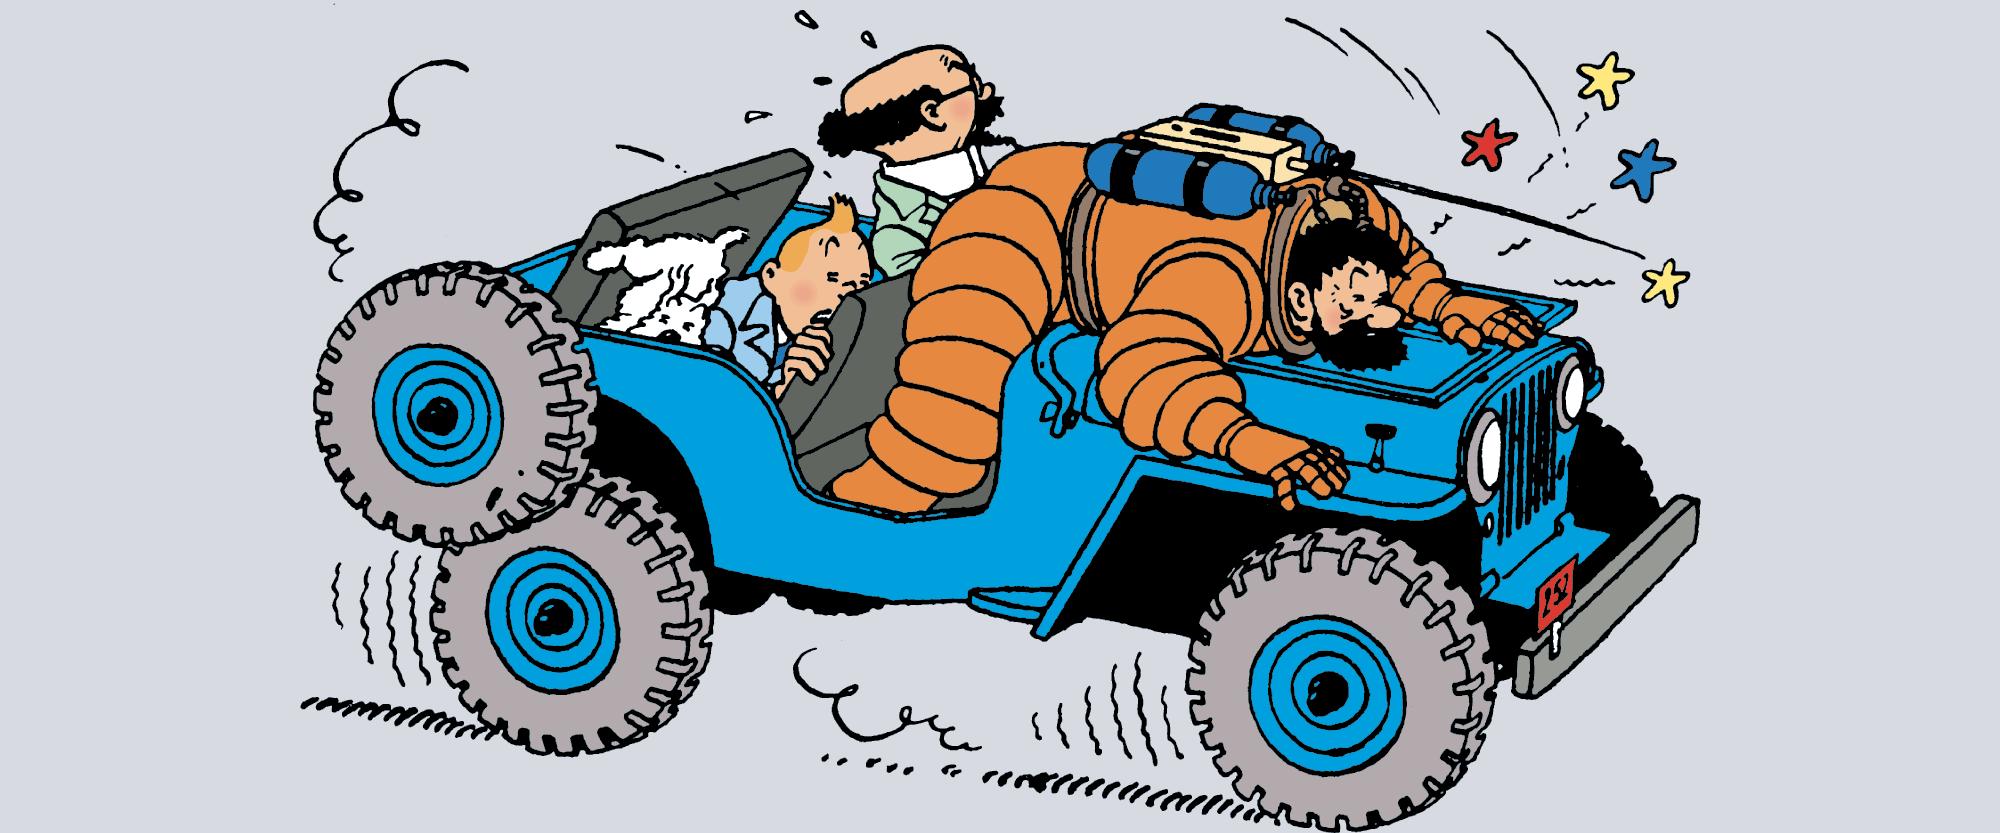 Tintin - Les Aventures de Tintin - Objectif Lune